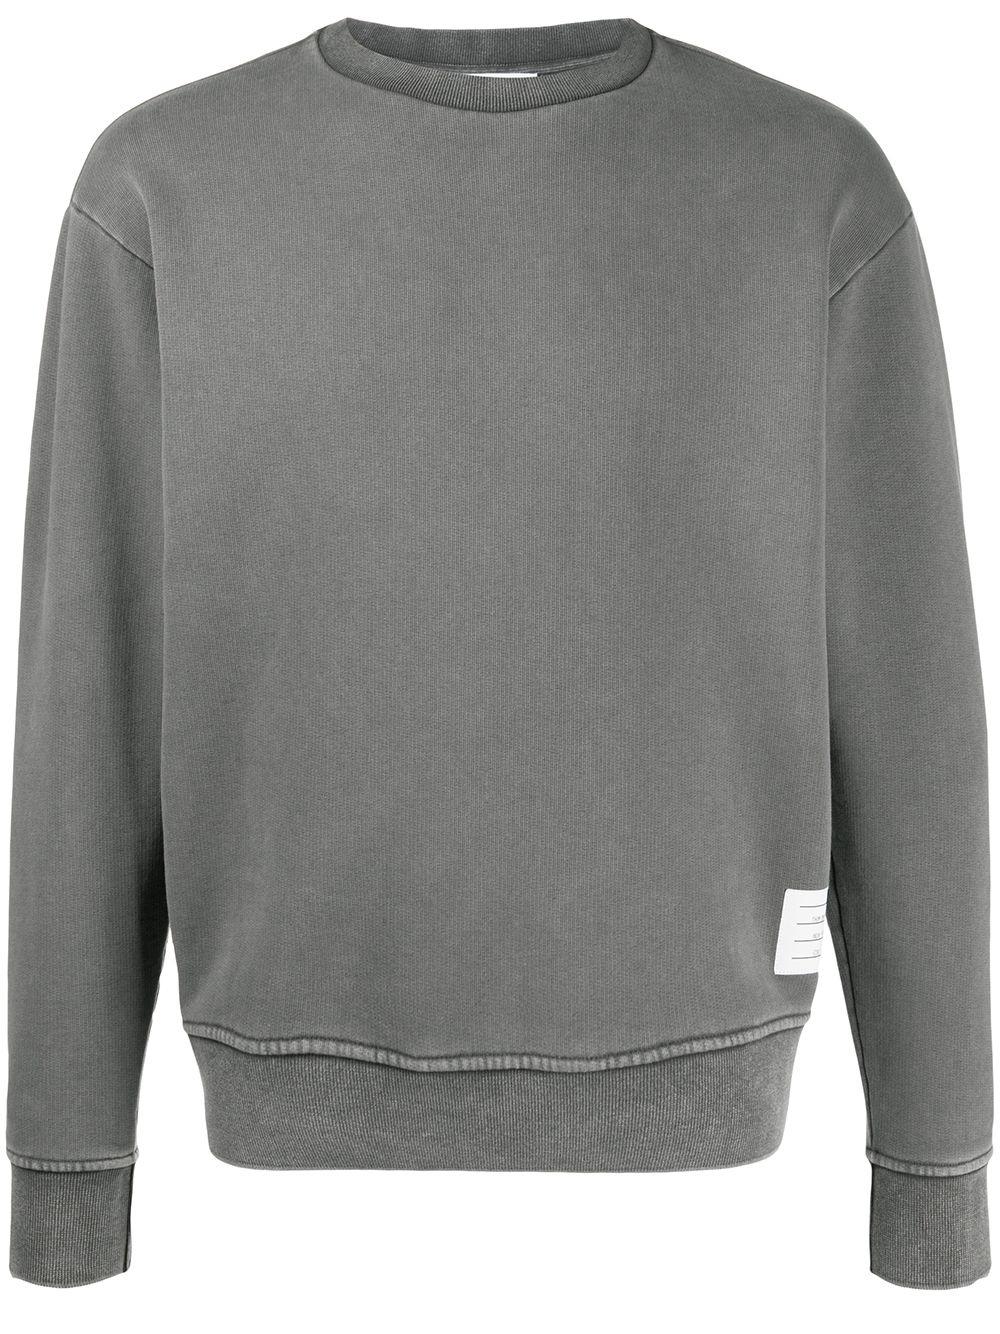 Thom Browne Sweatshirt mit Logo-Patch - Grau